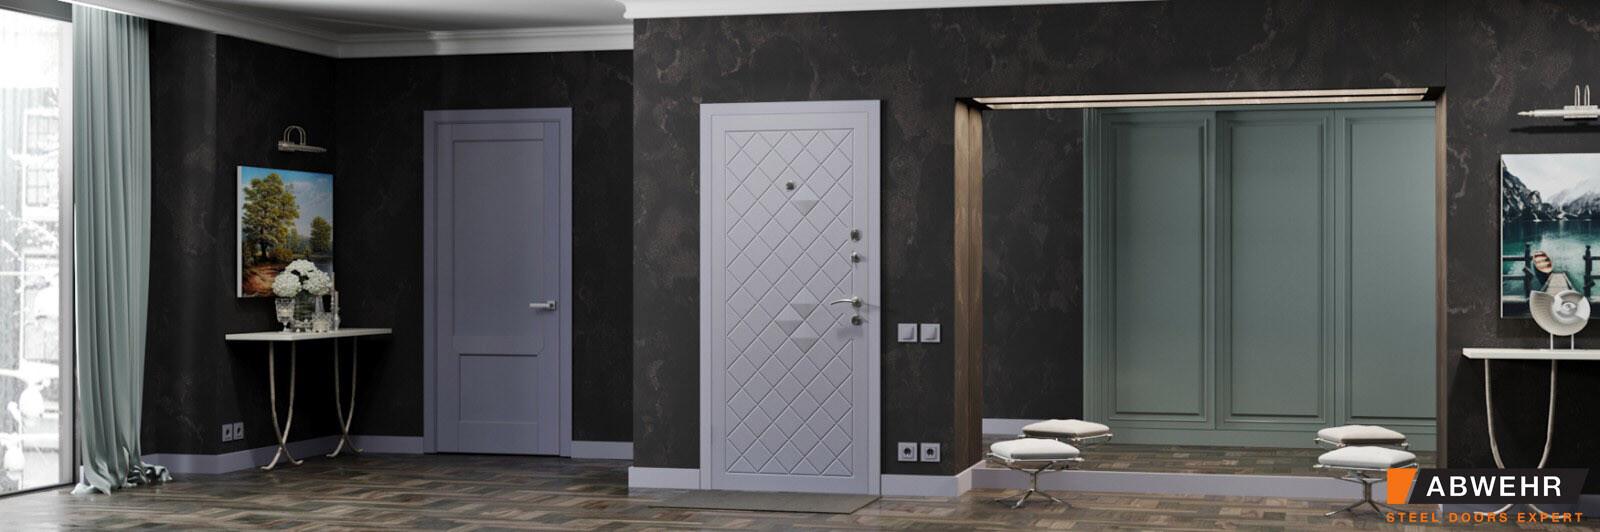 Двери Абвер Селина фото в интерьере